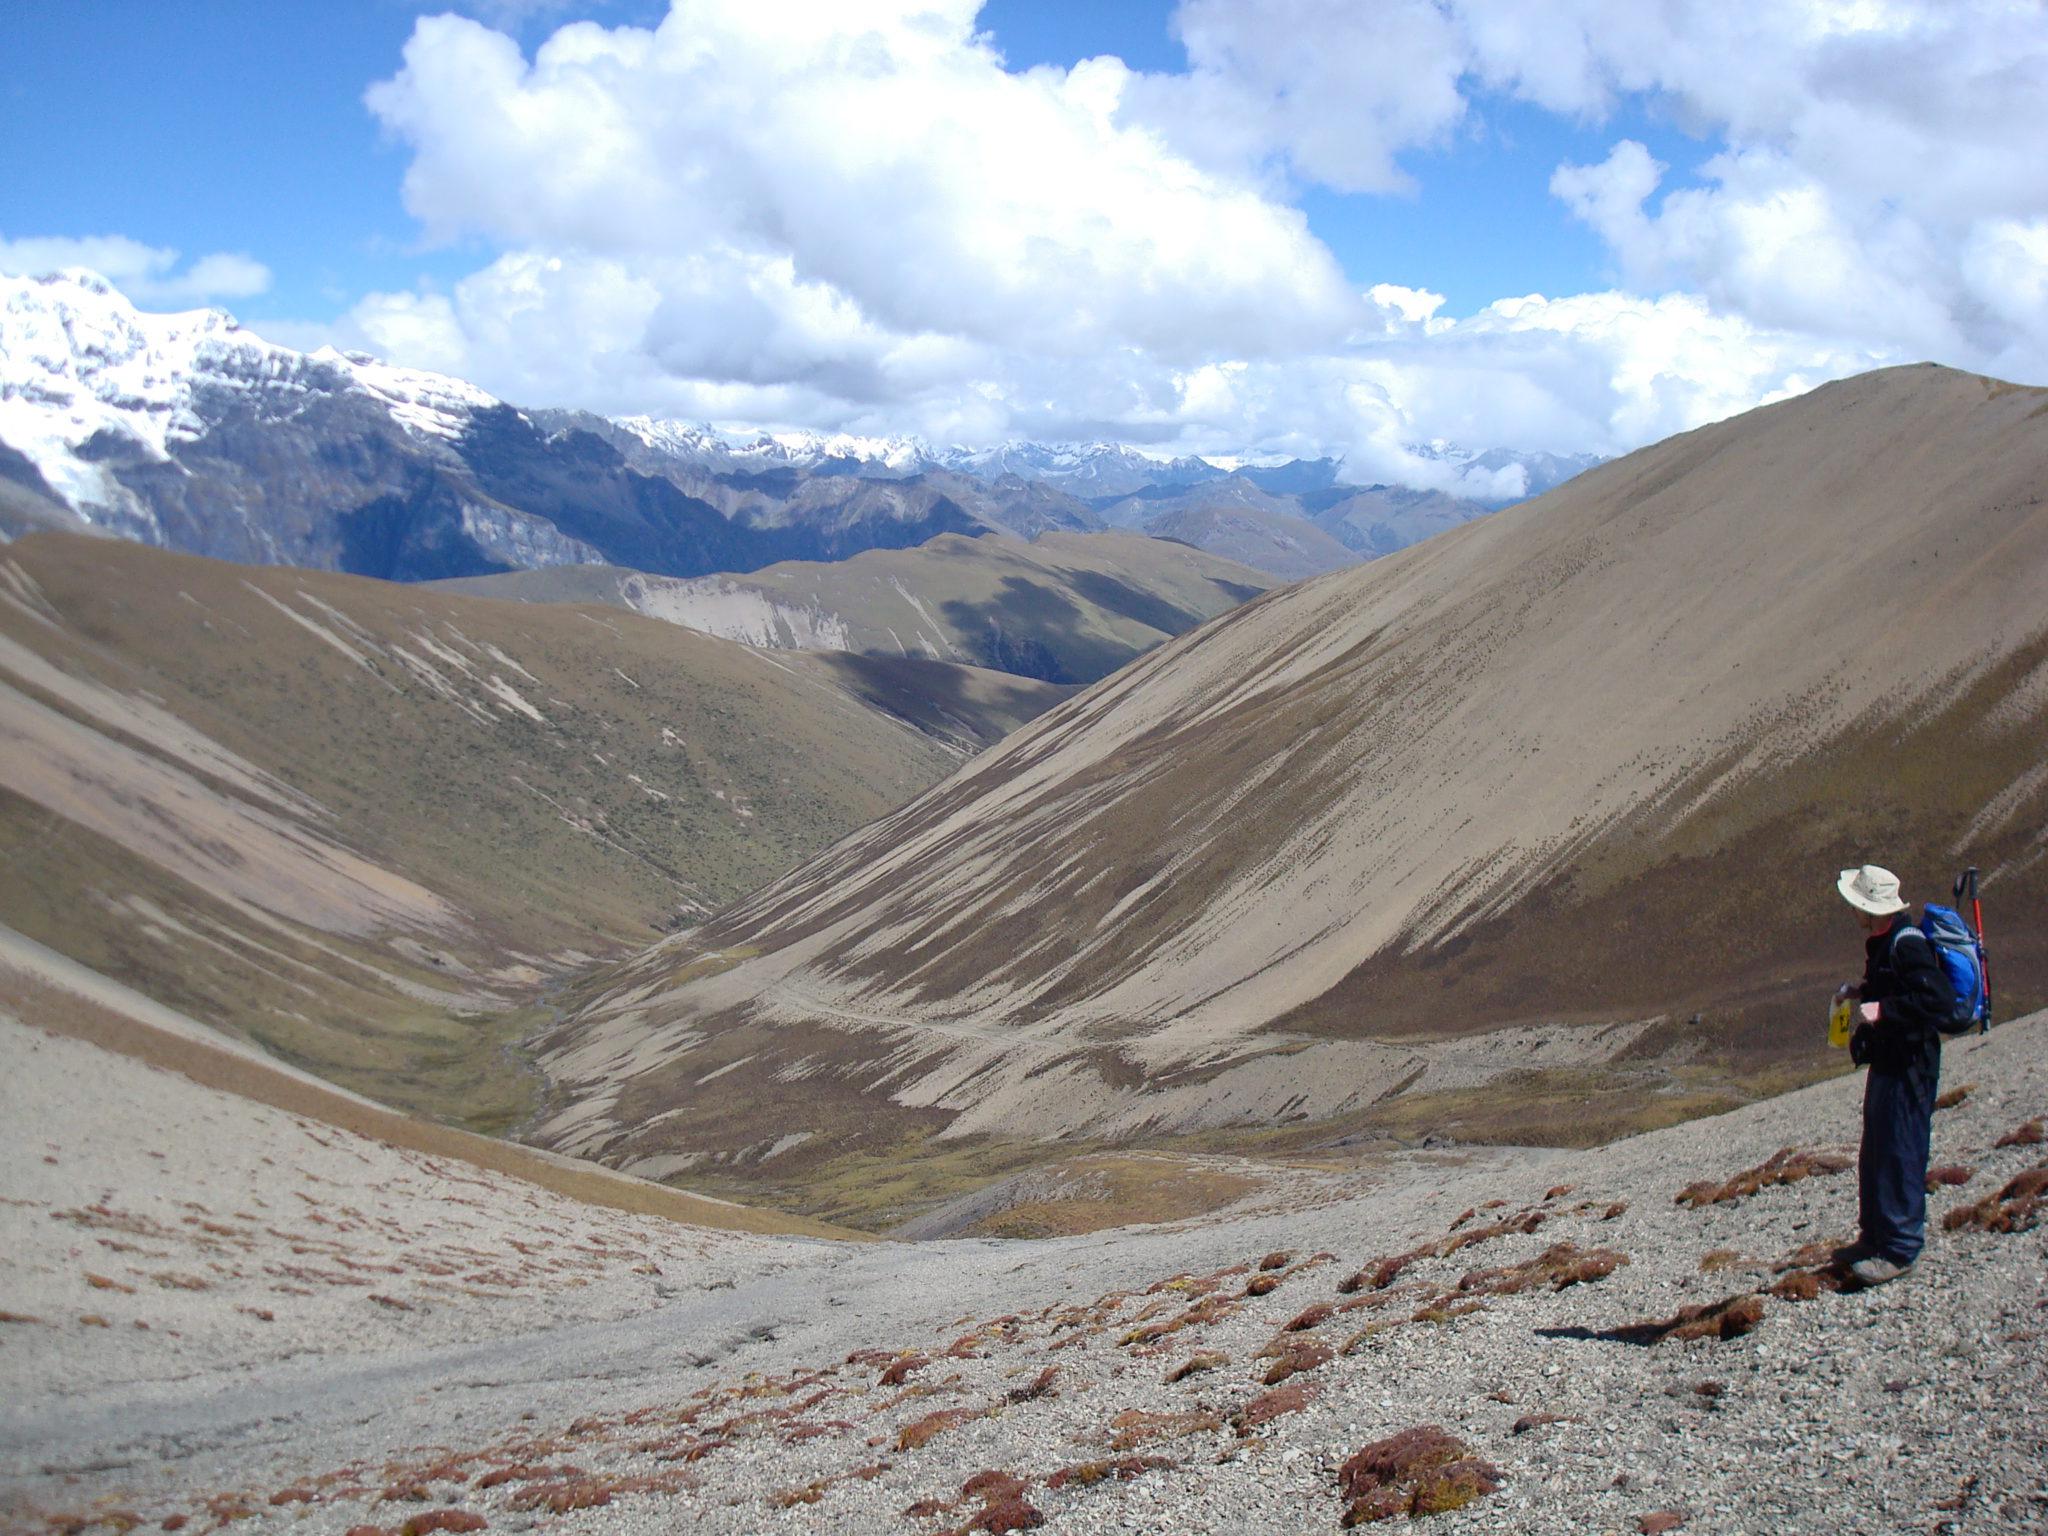 Lunana Snowman trek in Bhutan: Remote Himalaya trekking adventure